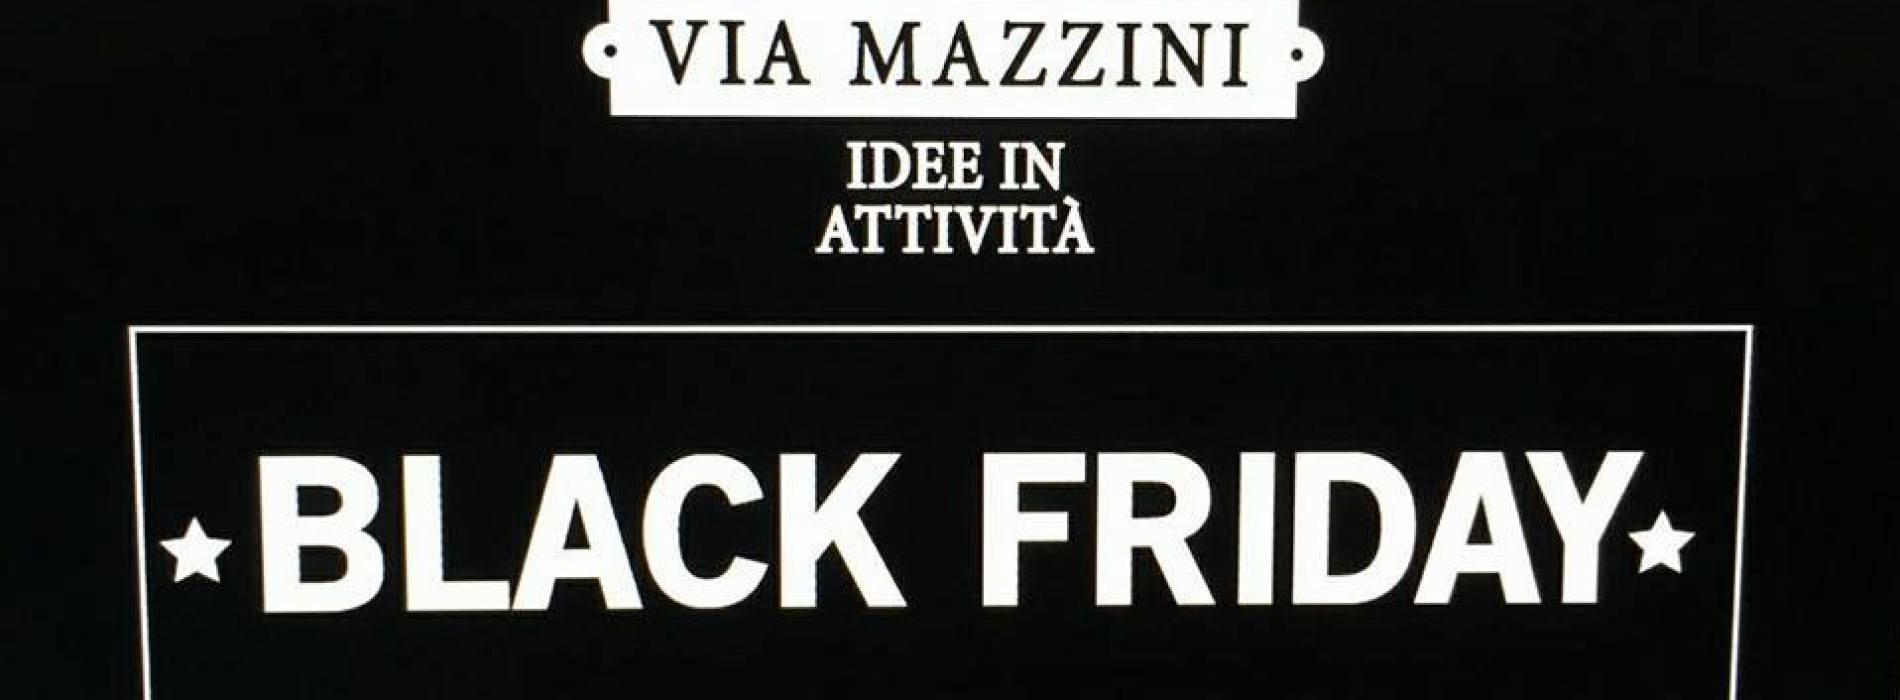 I Love Shopping? No problem, Black Friday in via Mazzini